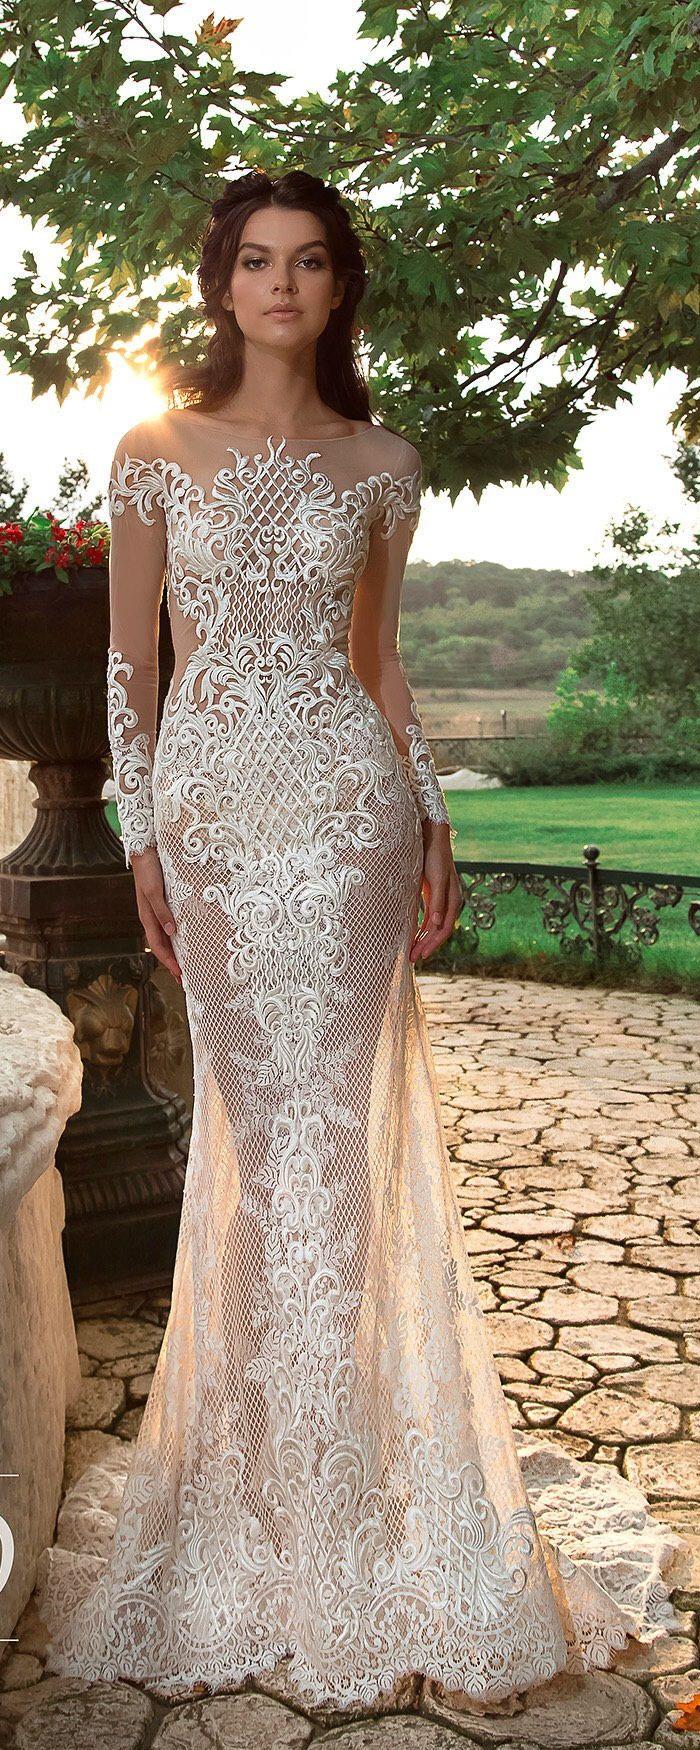 Sexy Sheath Wedding Dress Lace Mermaid Long Sleeve Bridal Gowns